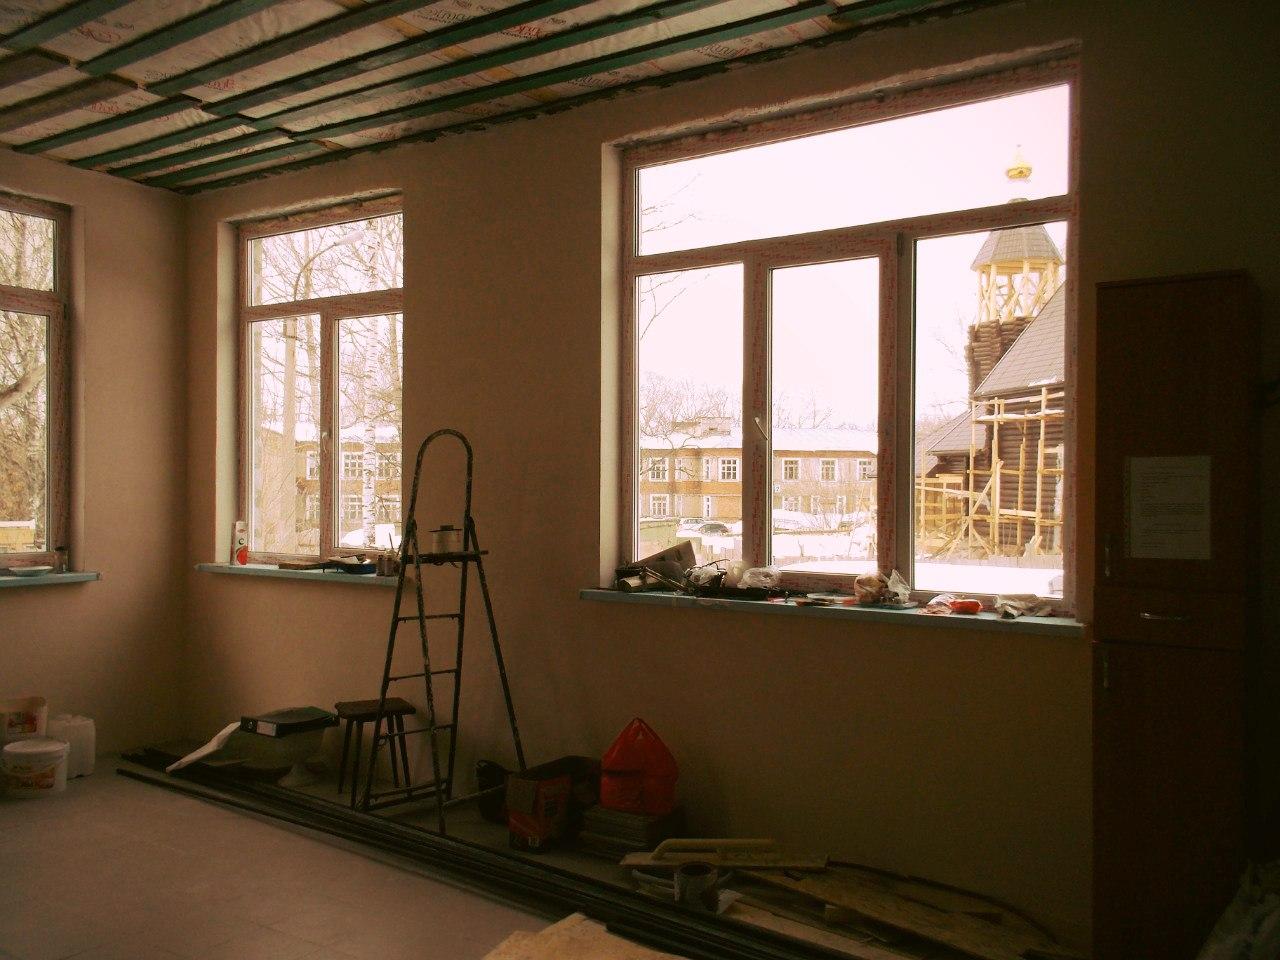 Проделана работа со стенами в трапезной, на полу уложена плитка. На подходе - работа с потолками.